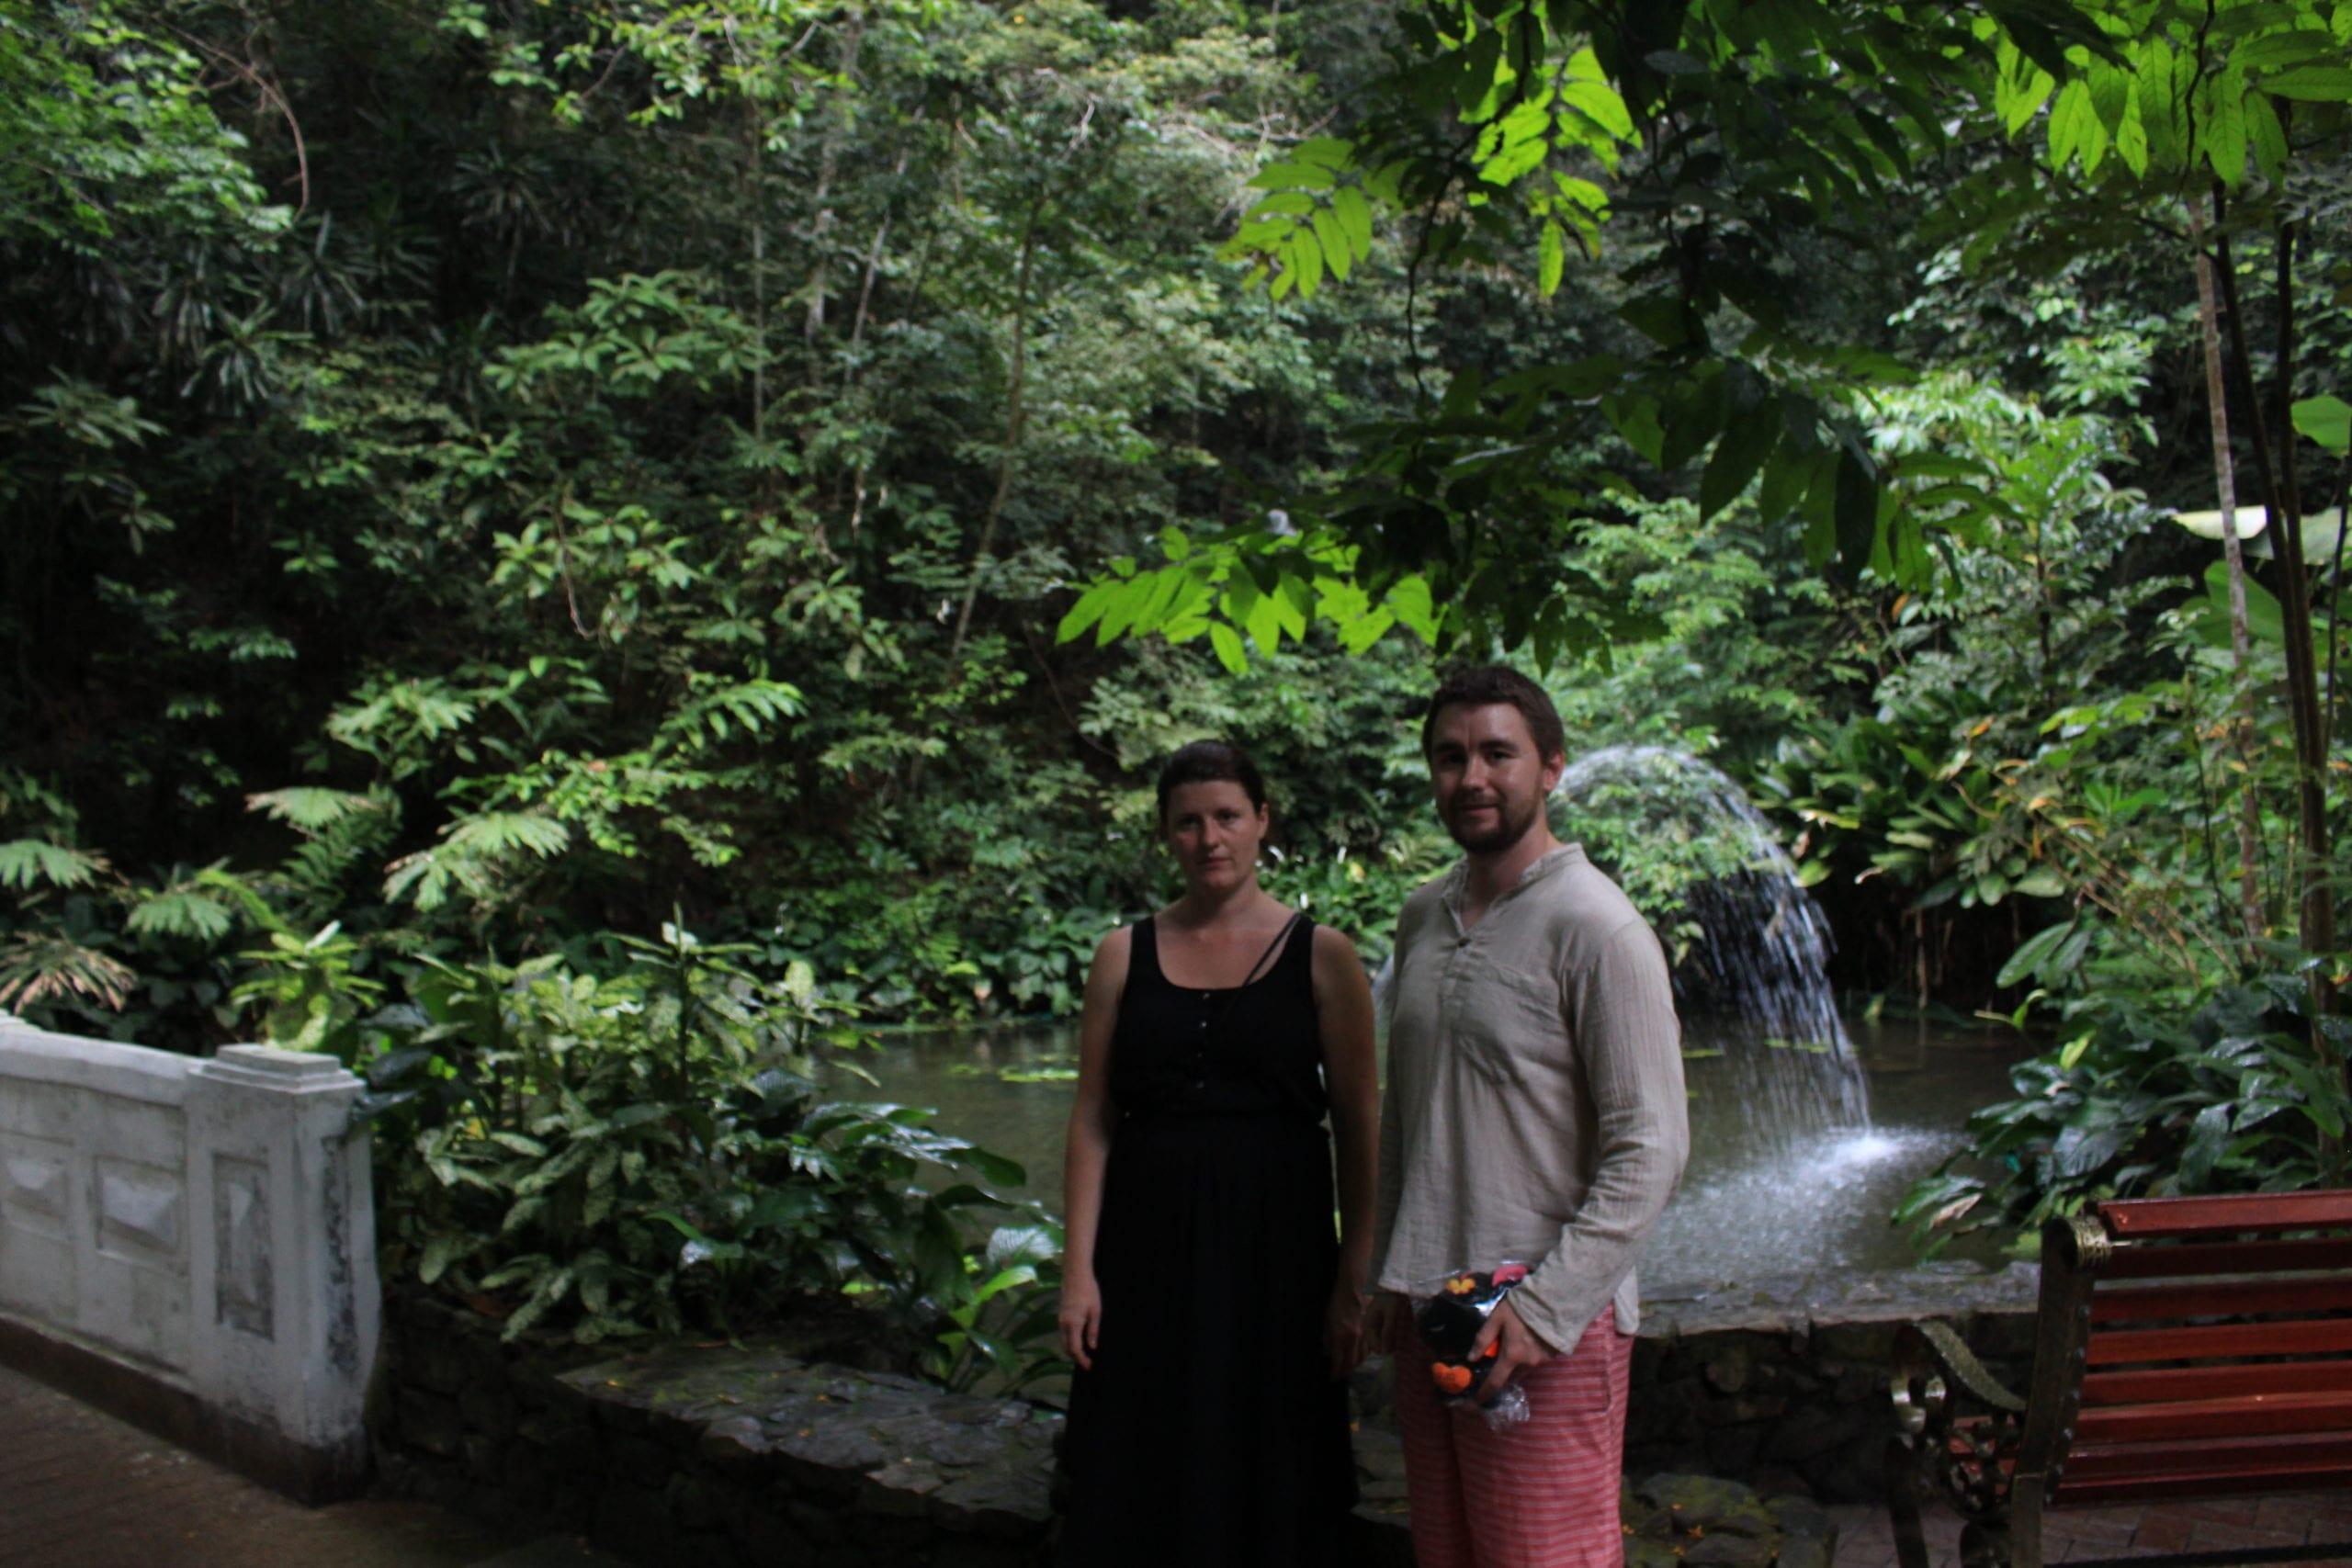 With my Brother at Penang Botanical Gardens